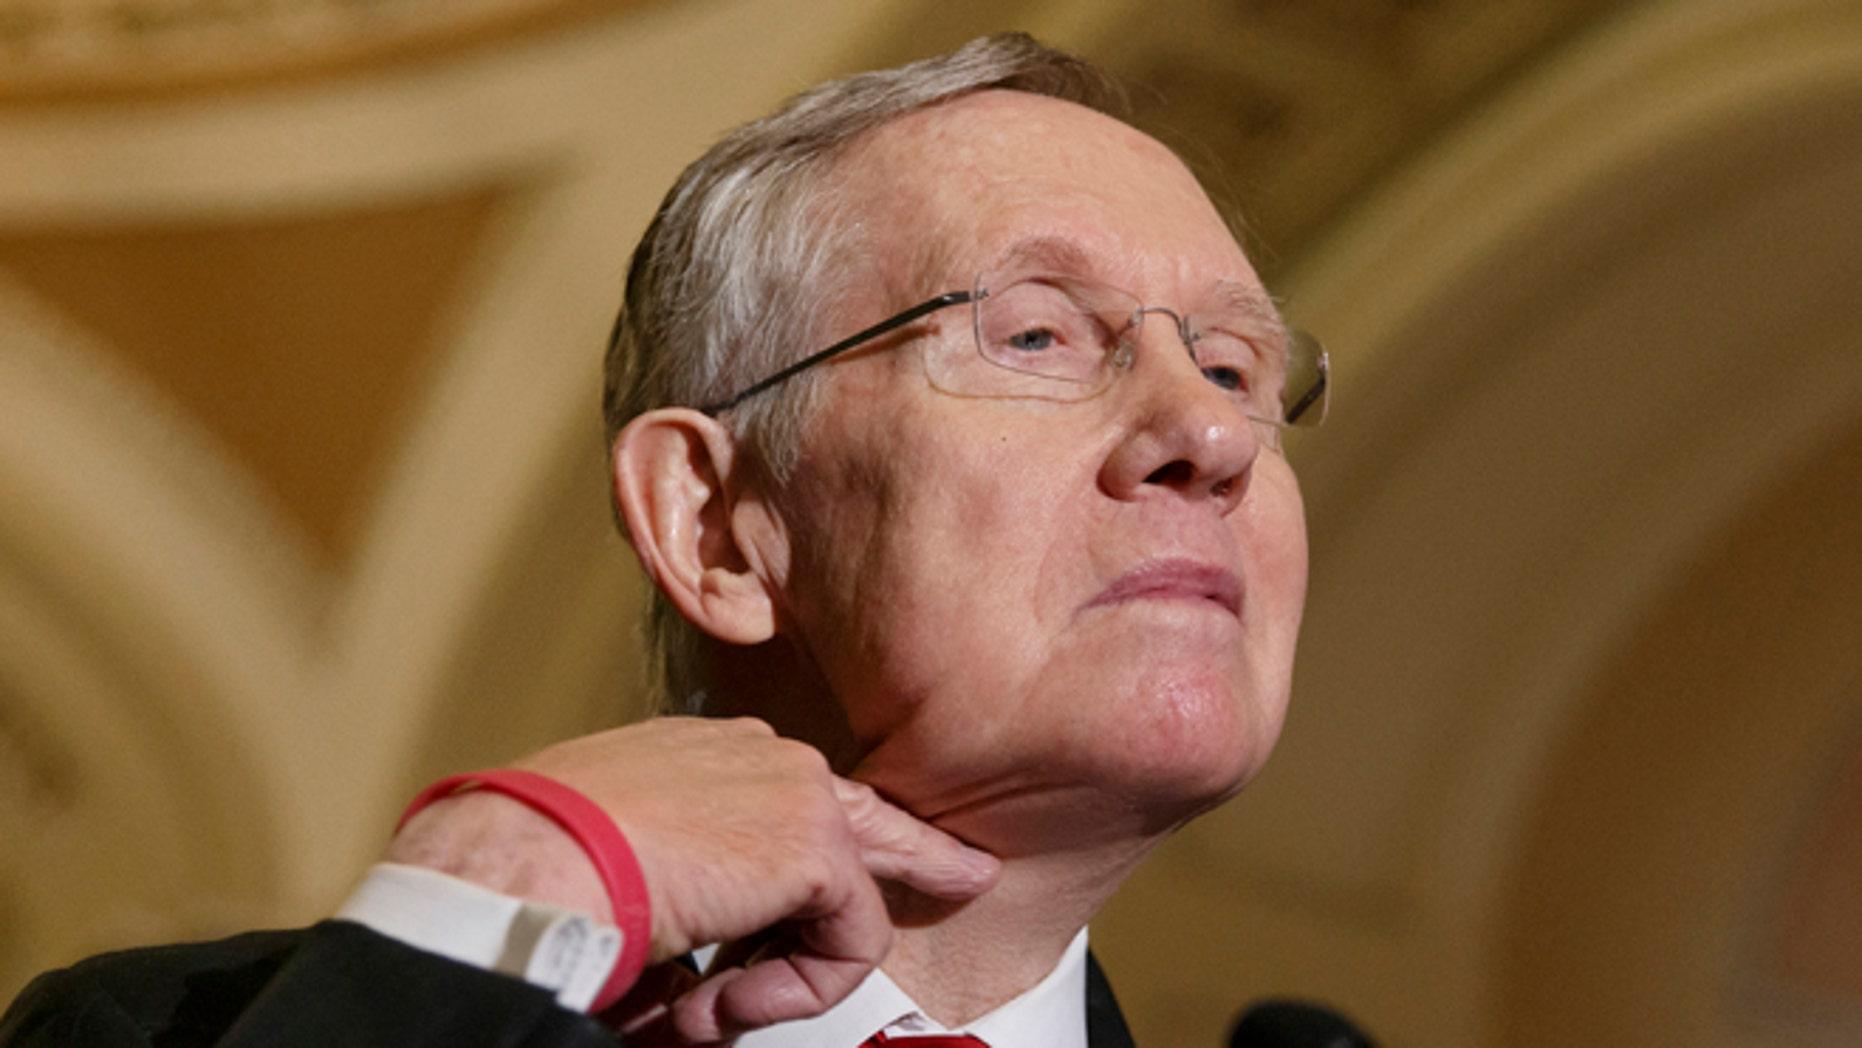 FILE: March 11, 2014: Senate Majority Leader Harry Reid, D-Nevada, on Capitol Hill in Washington, D.C.